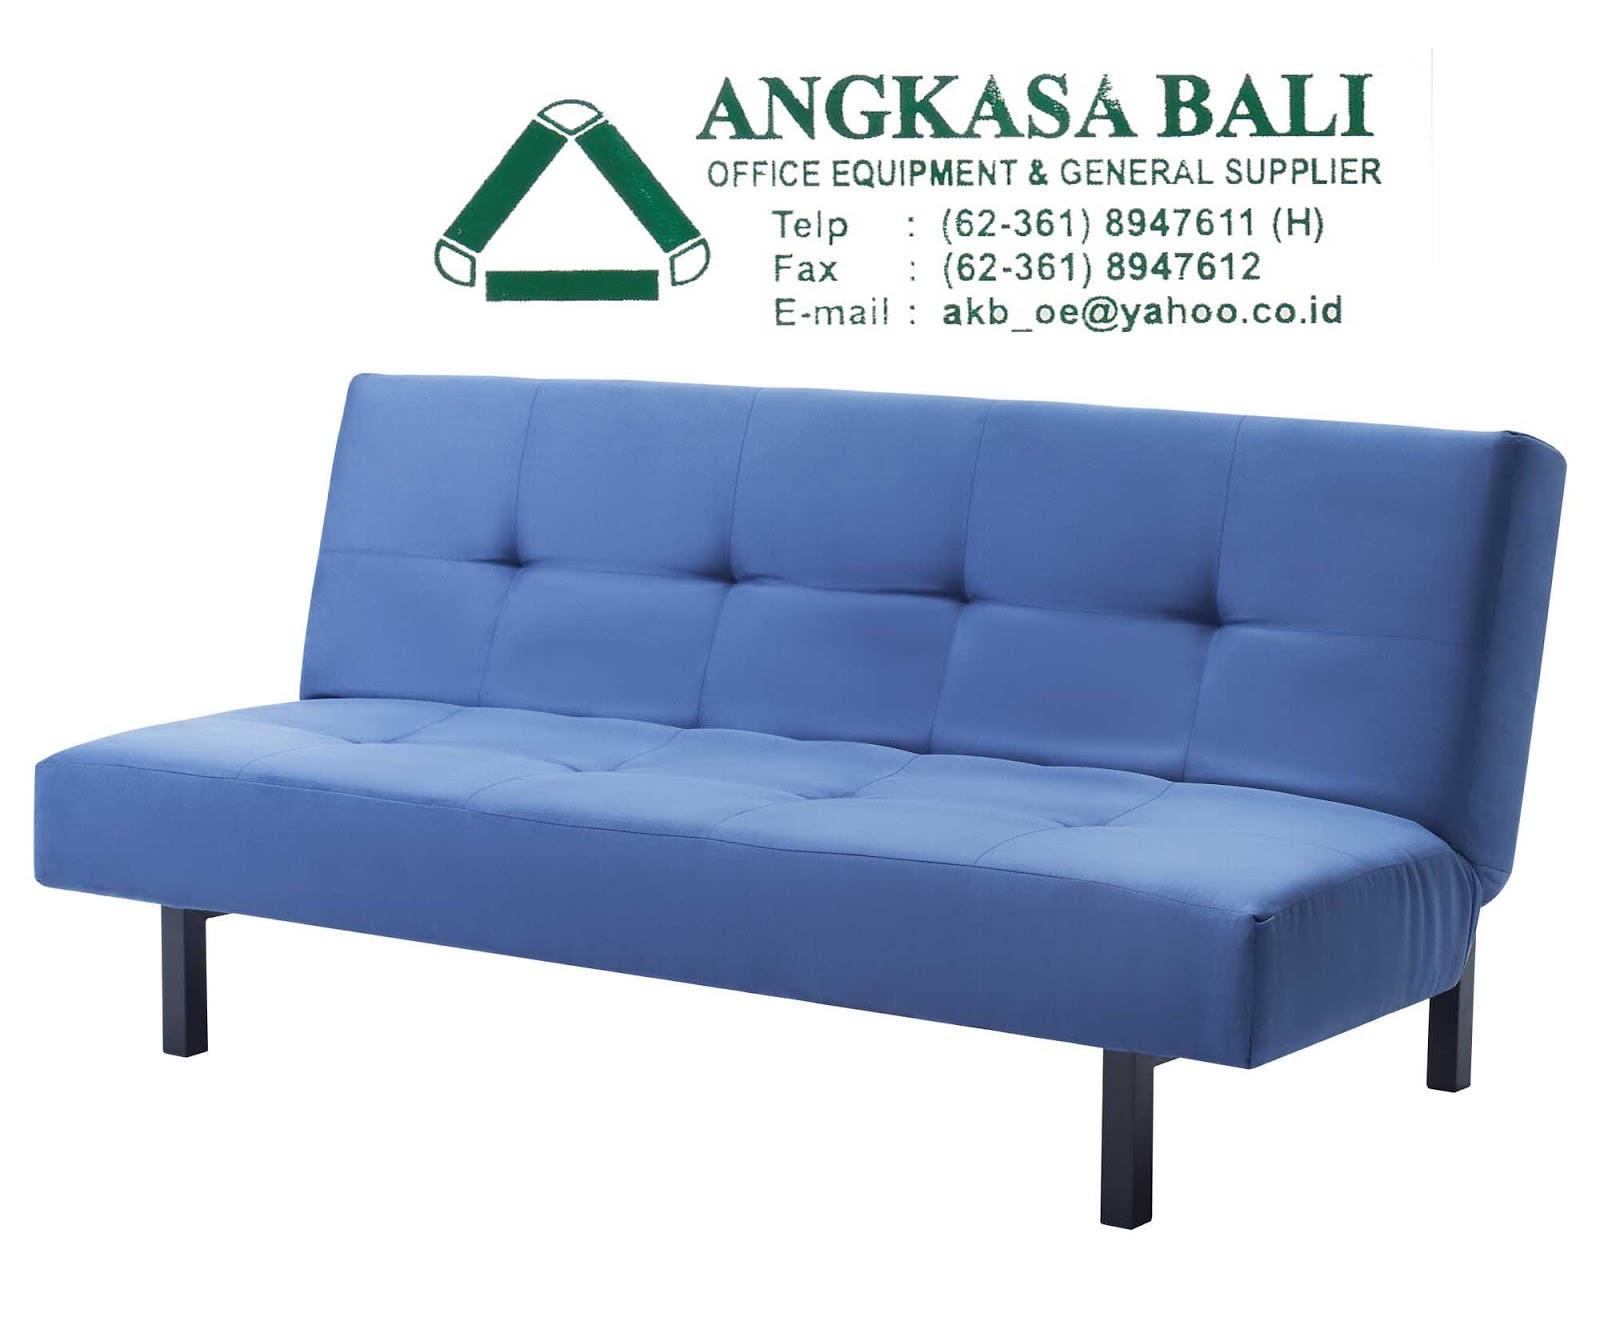 indonesian sofa bed living room ideas with sectional sofas angkasa bali furniture distributor kursi meja kantor